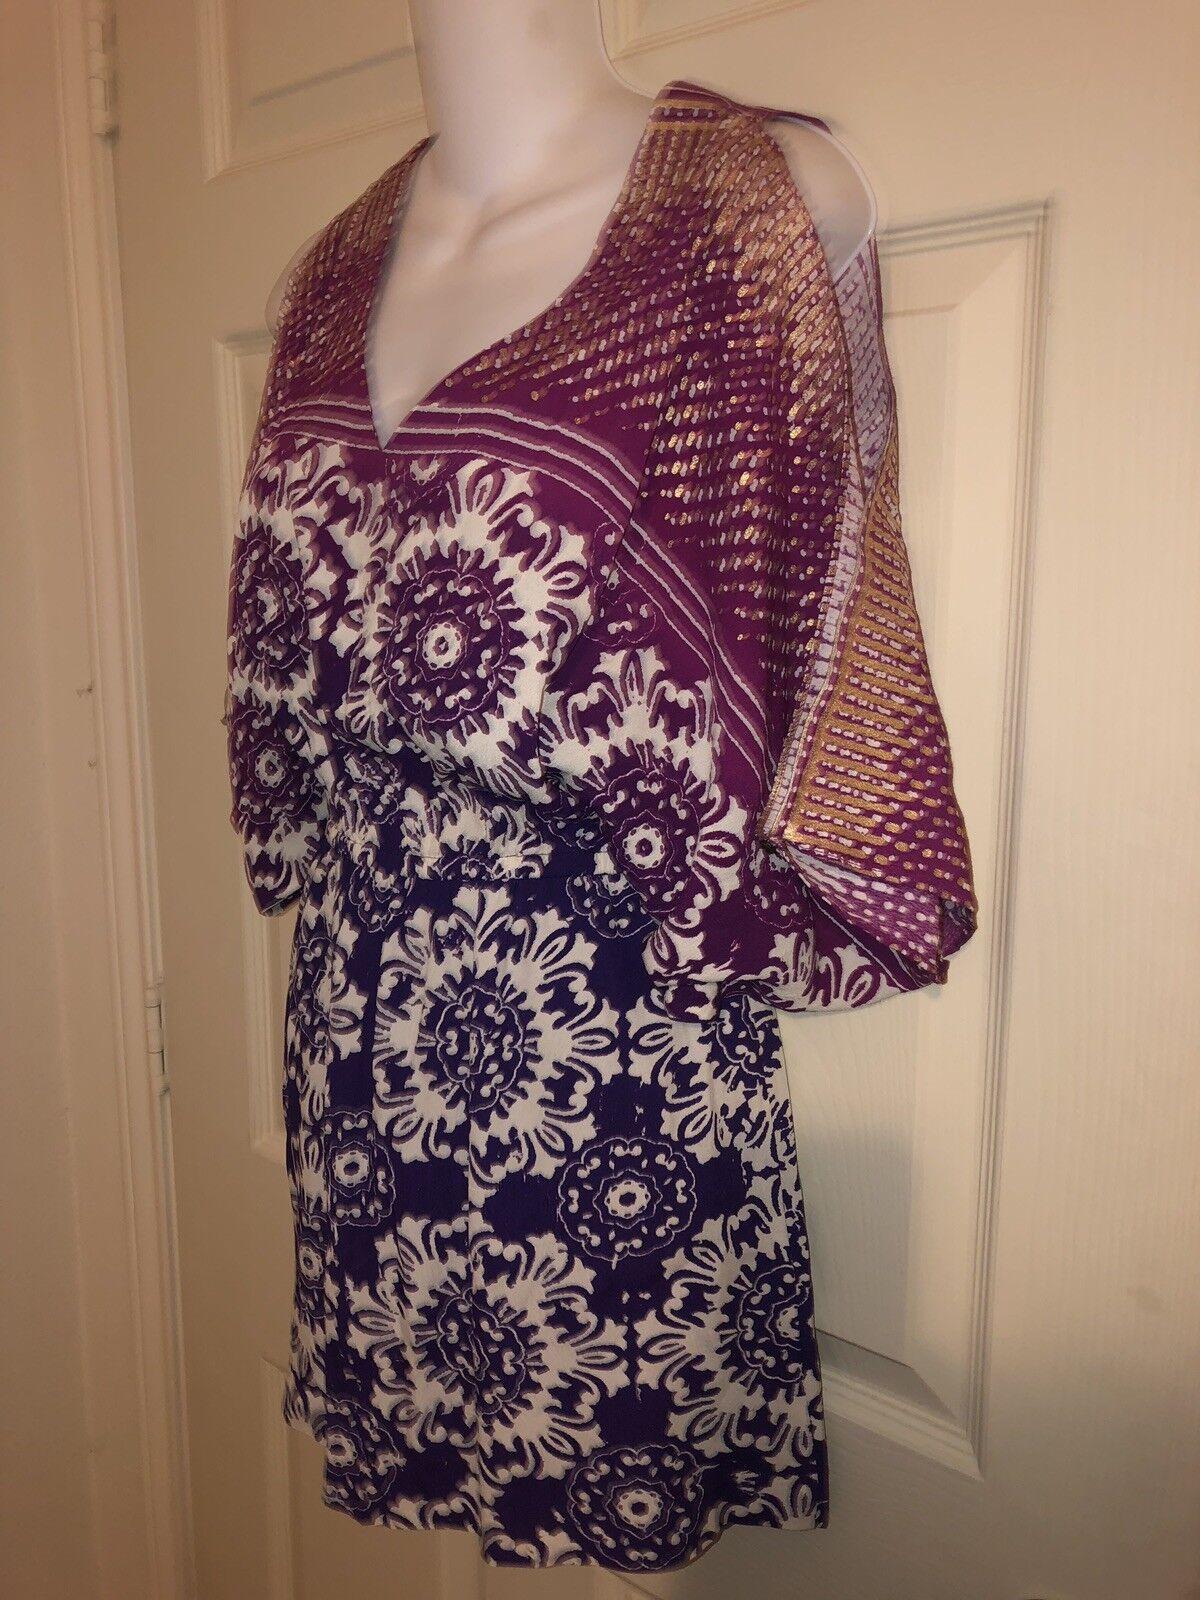 Nicole Miller Artelier 006082 Boho Cold Shoulder Elastic Waist Mini Dress Sz P